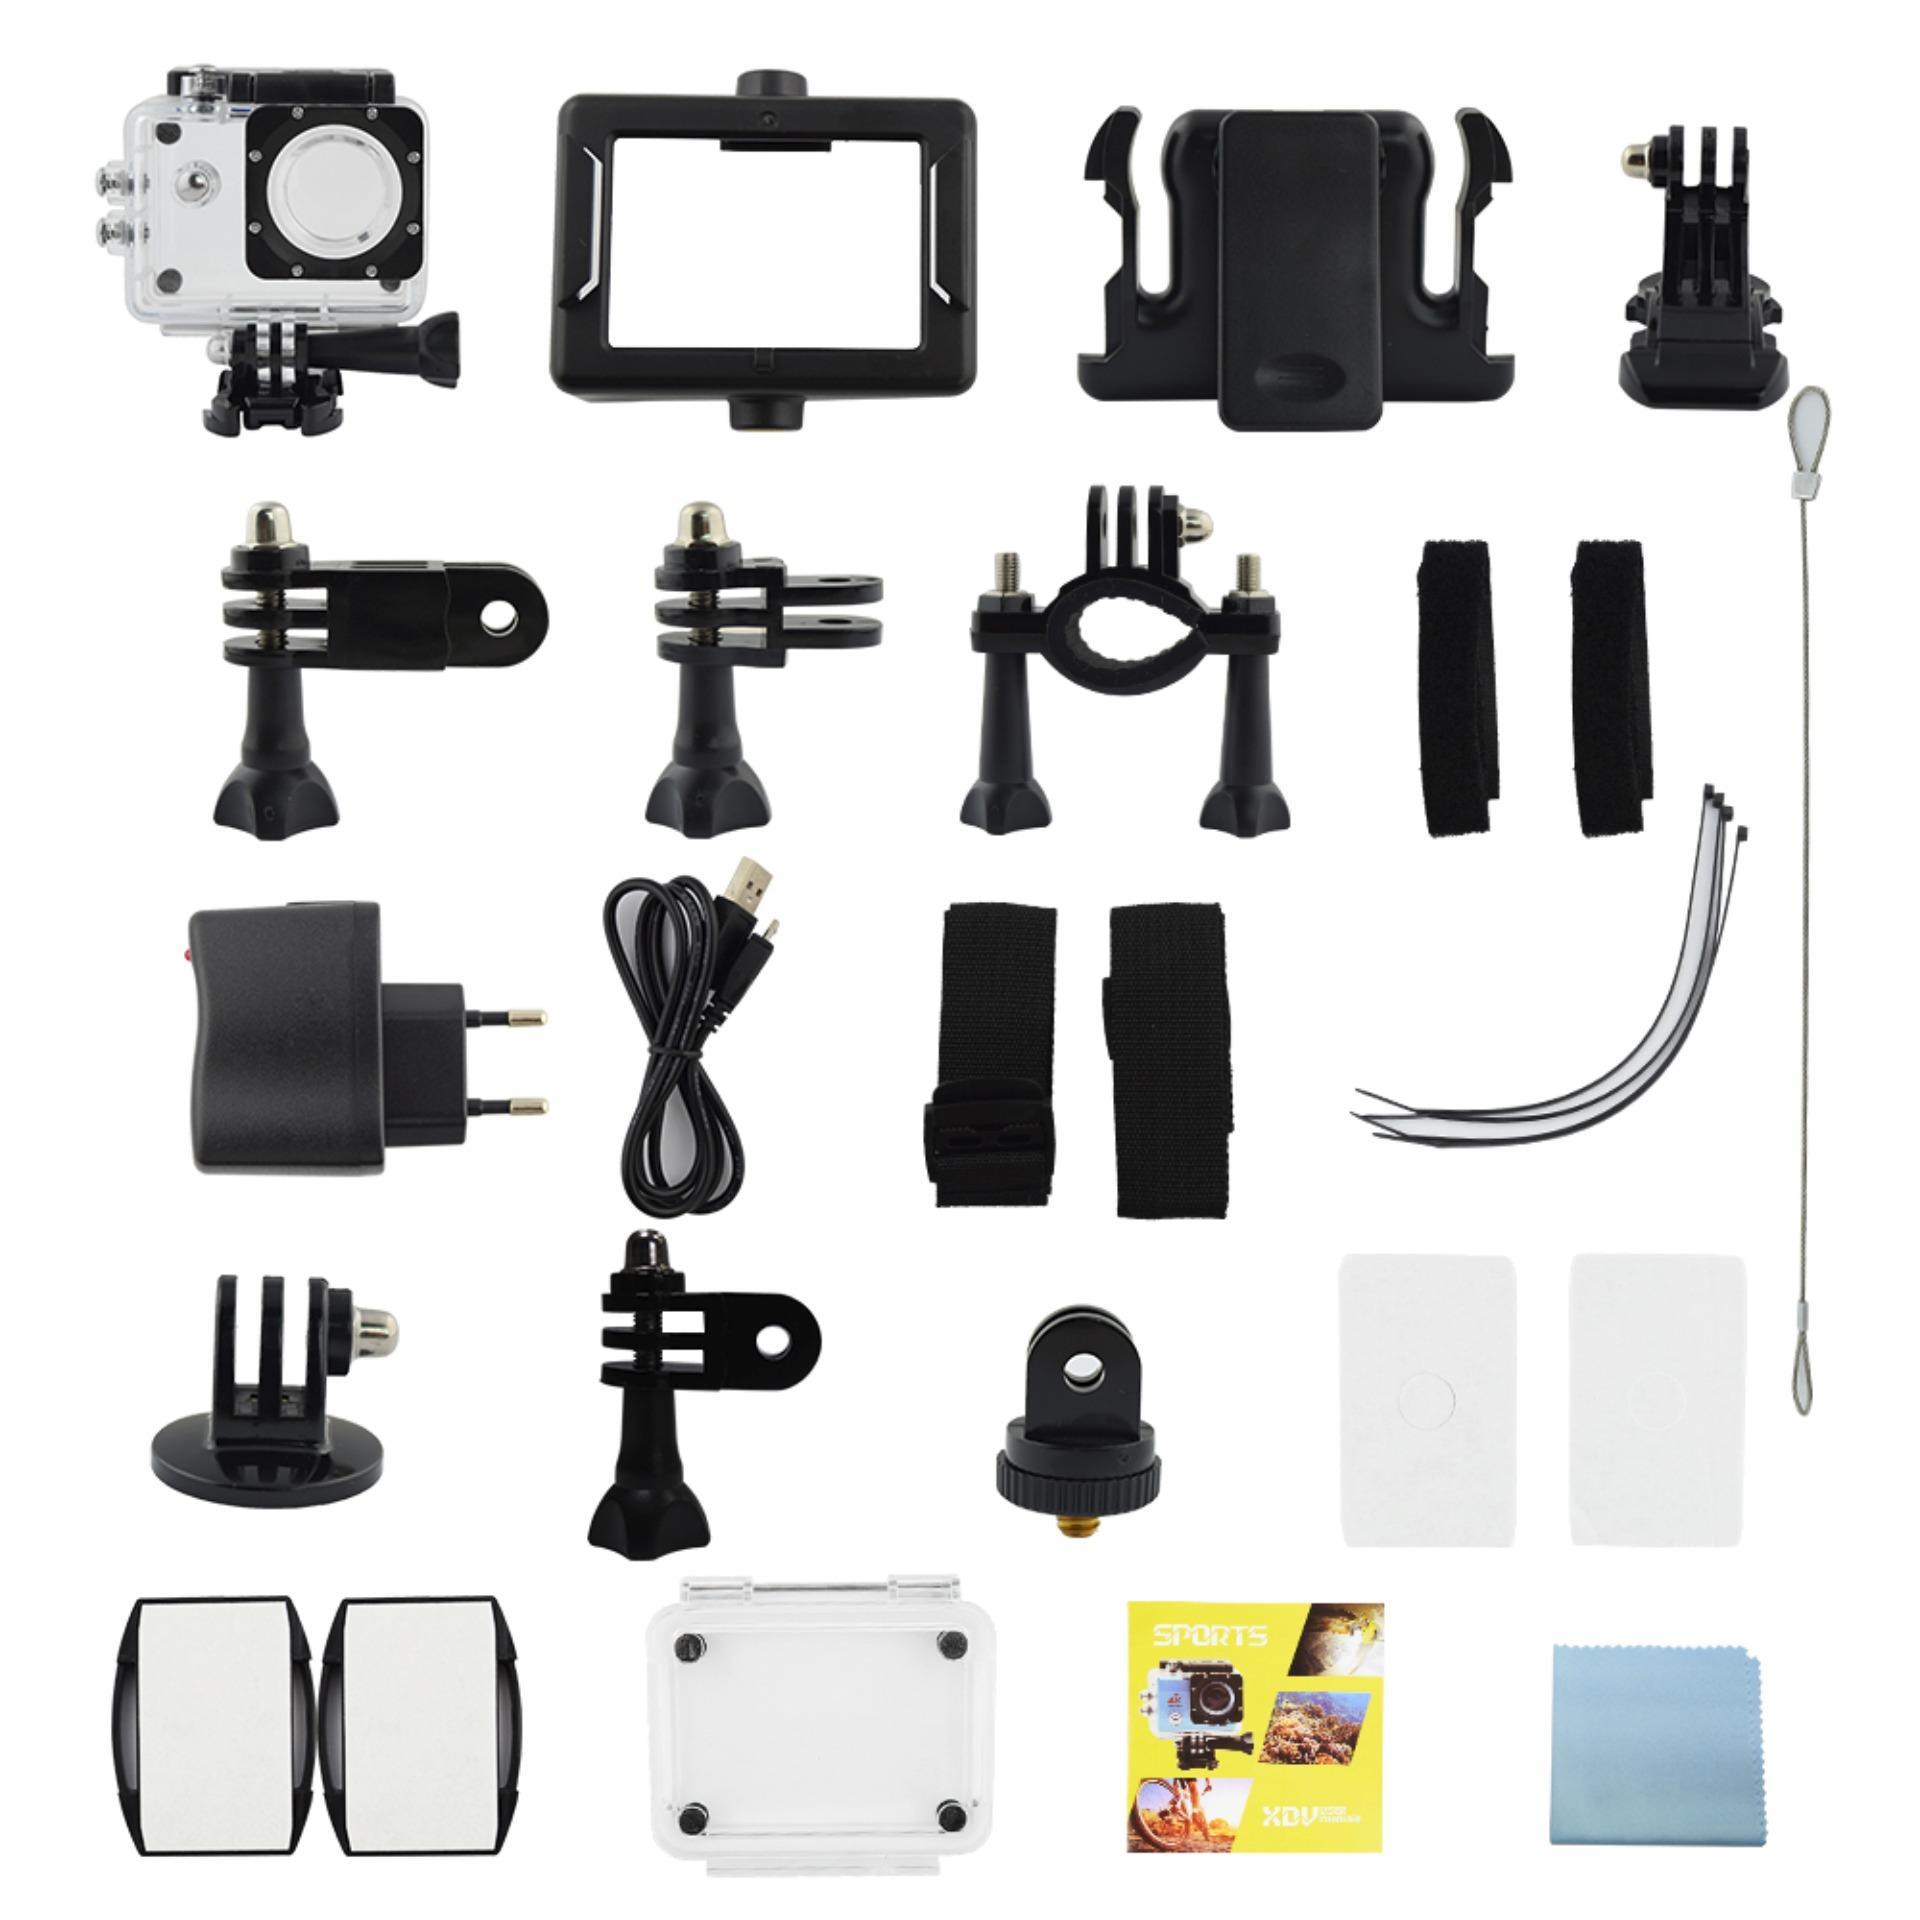 ... Kogan Action Camera 4K NV UltraHD - 16MP - Hitam - WIFI ...